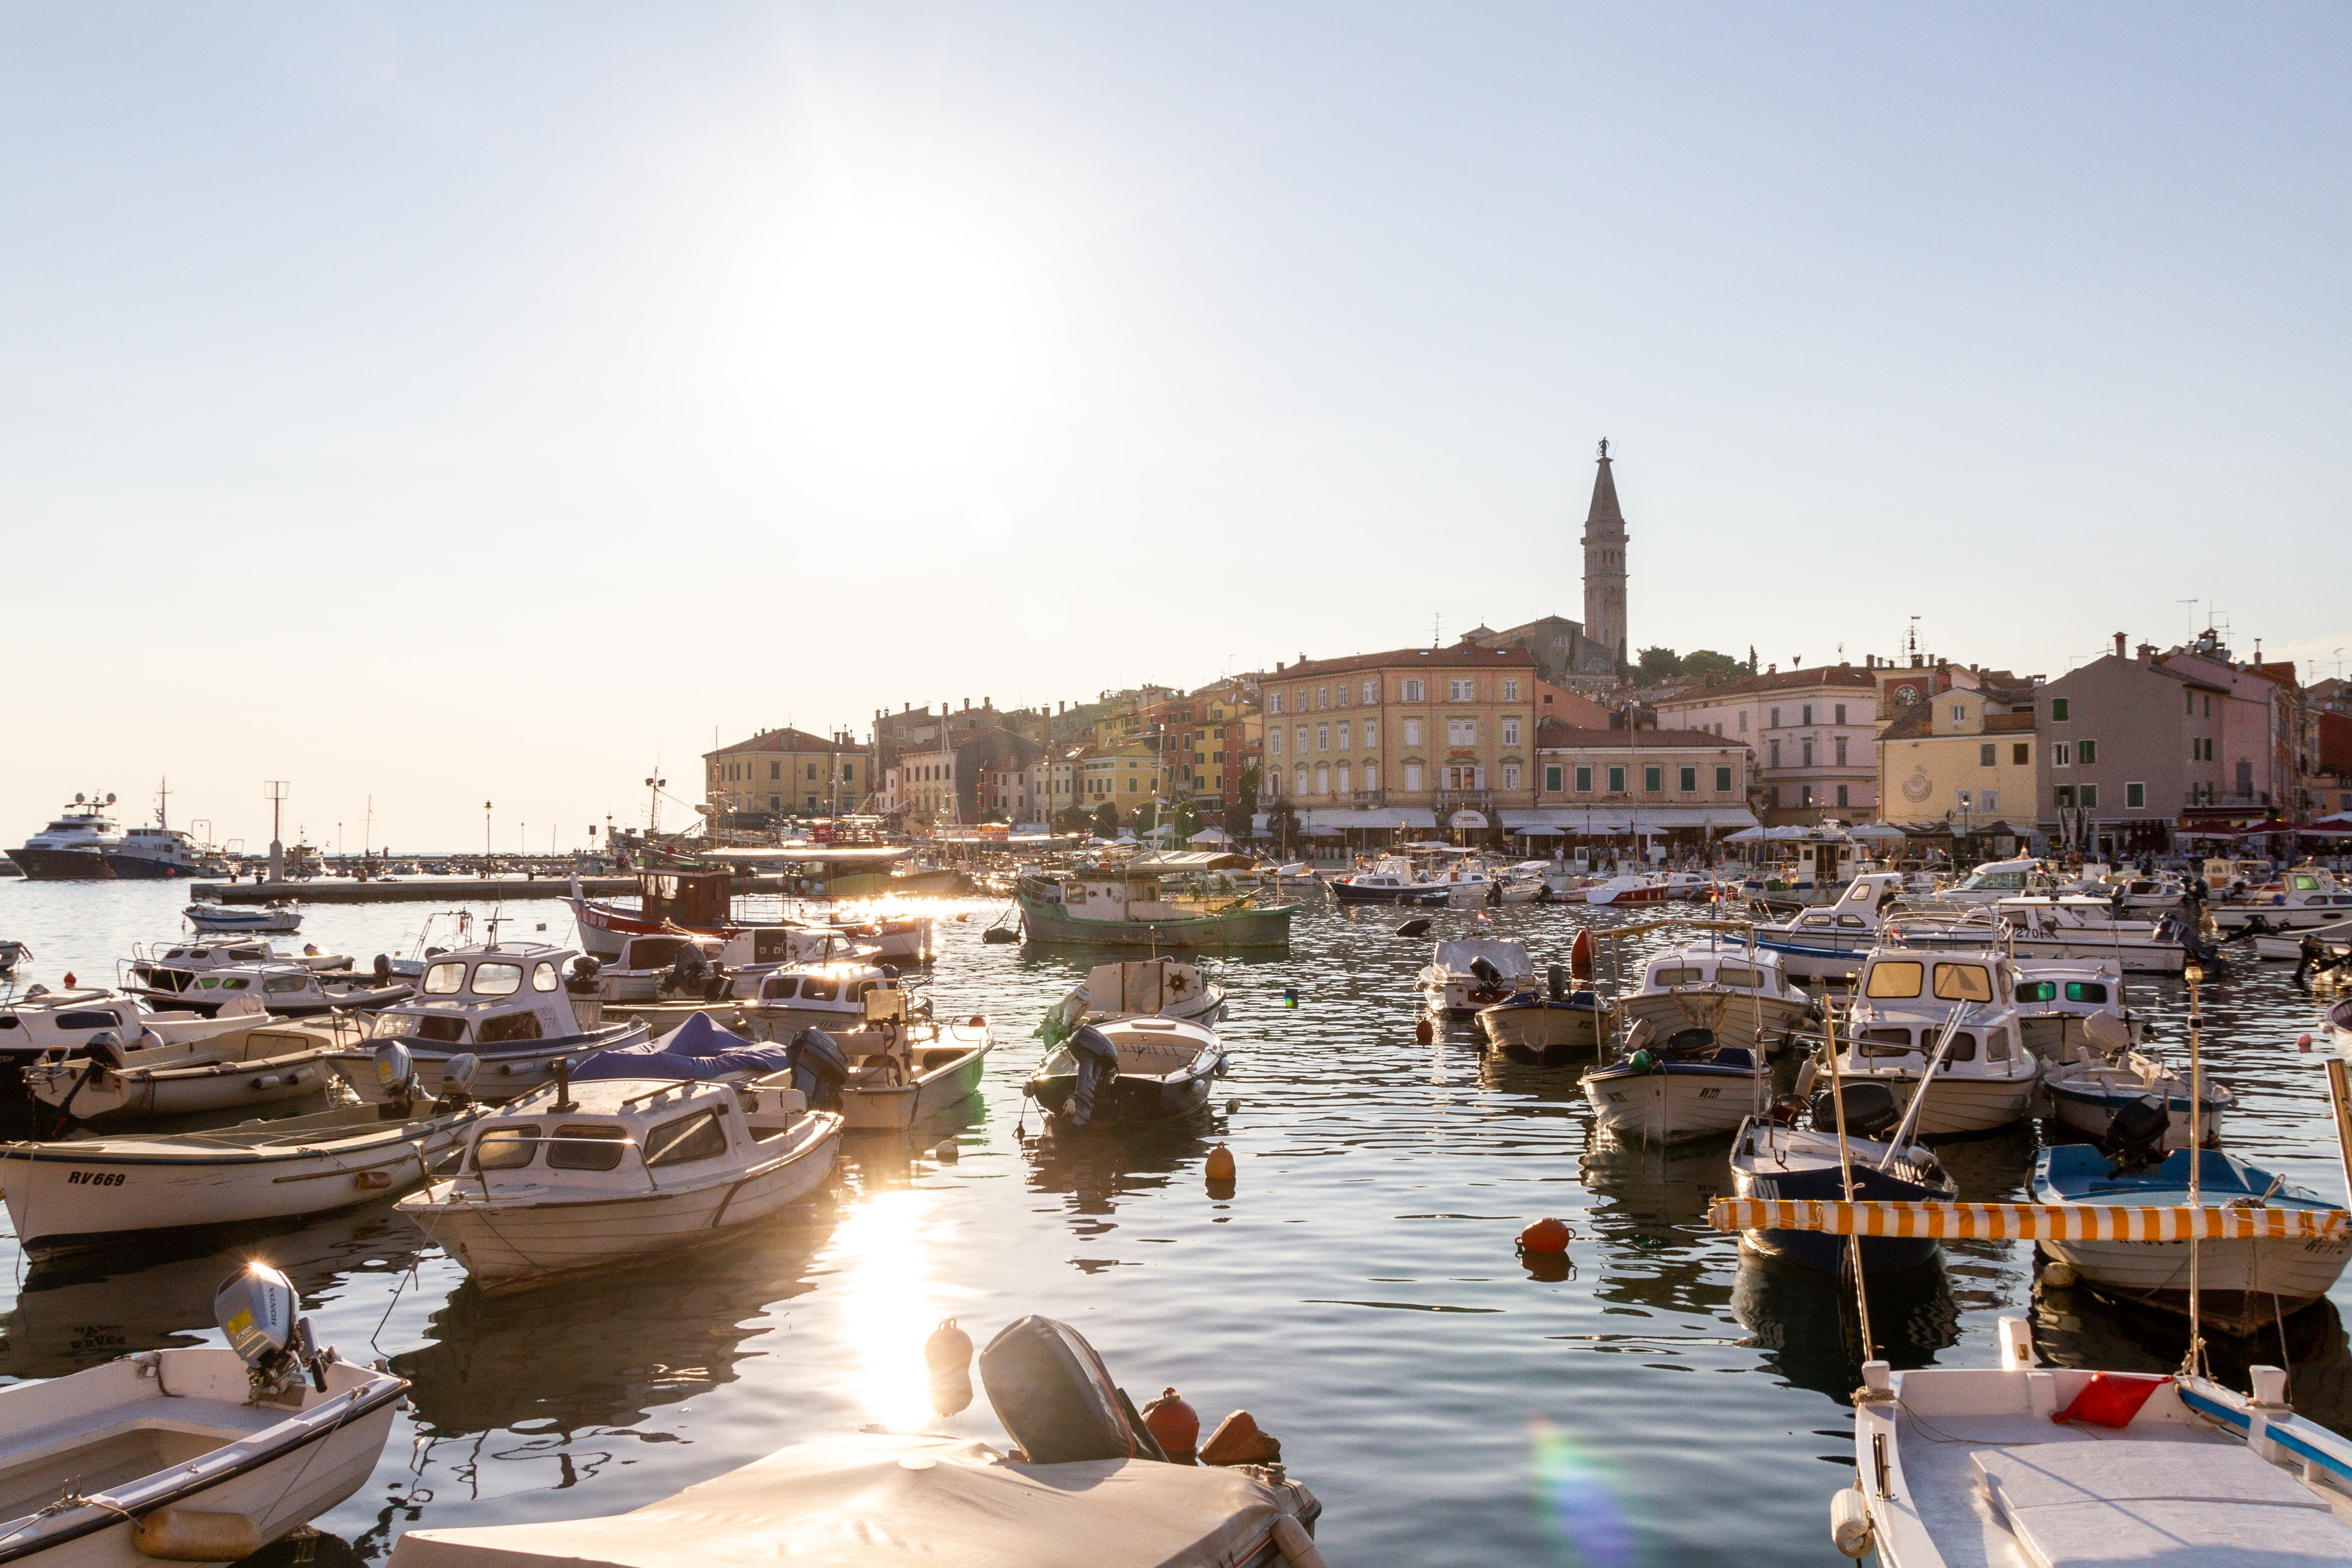 10 Best Things to do in Rovinj, Croatia